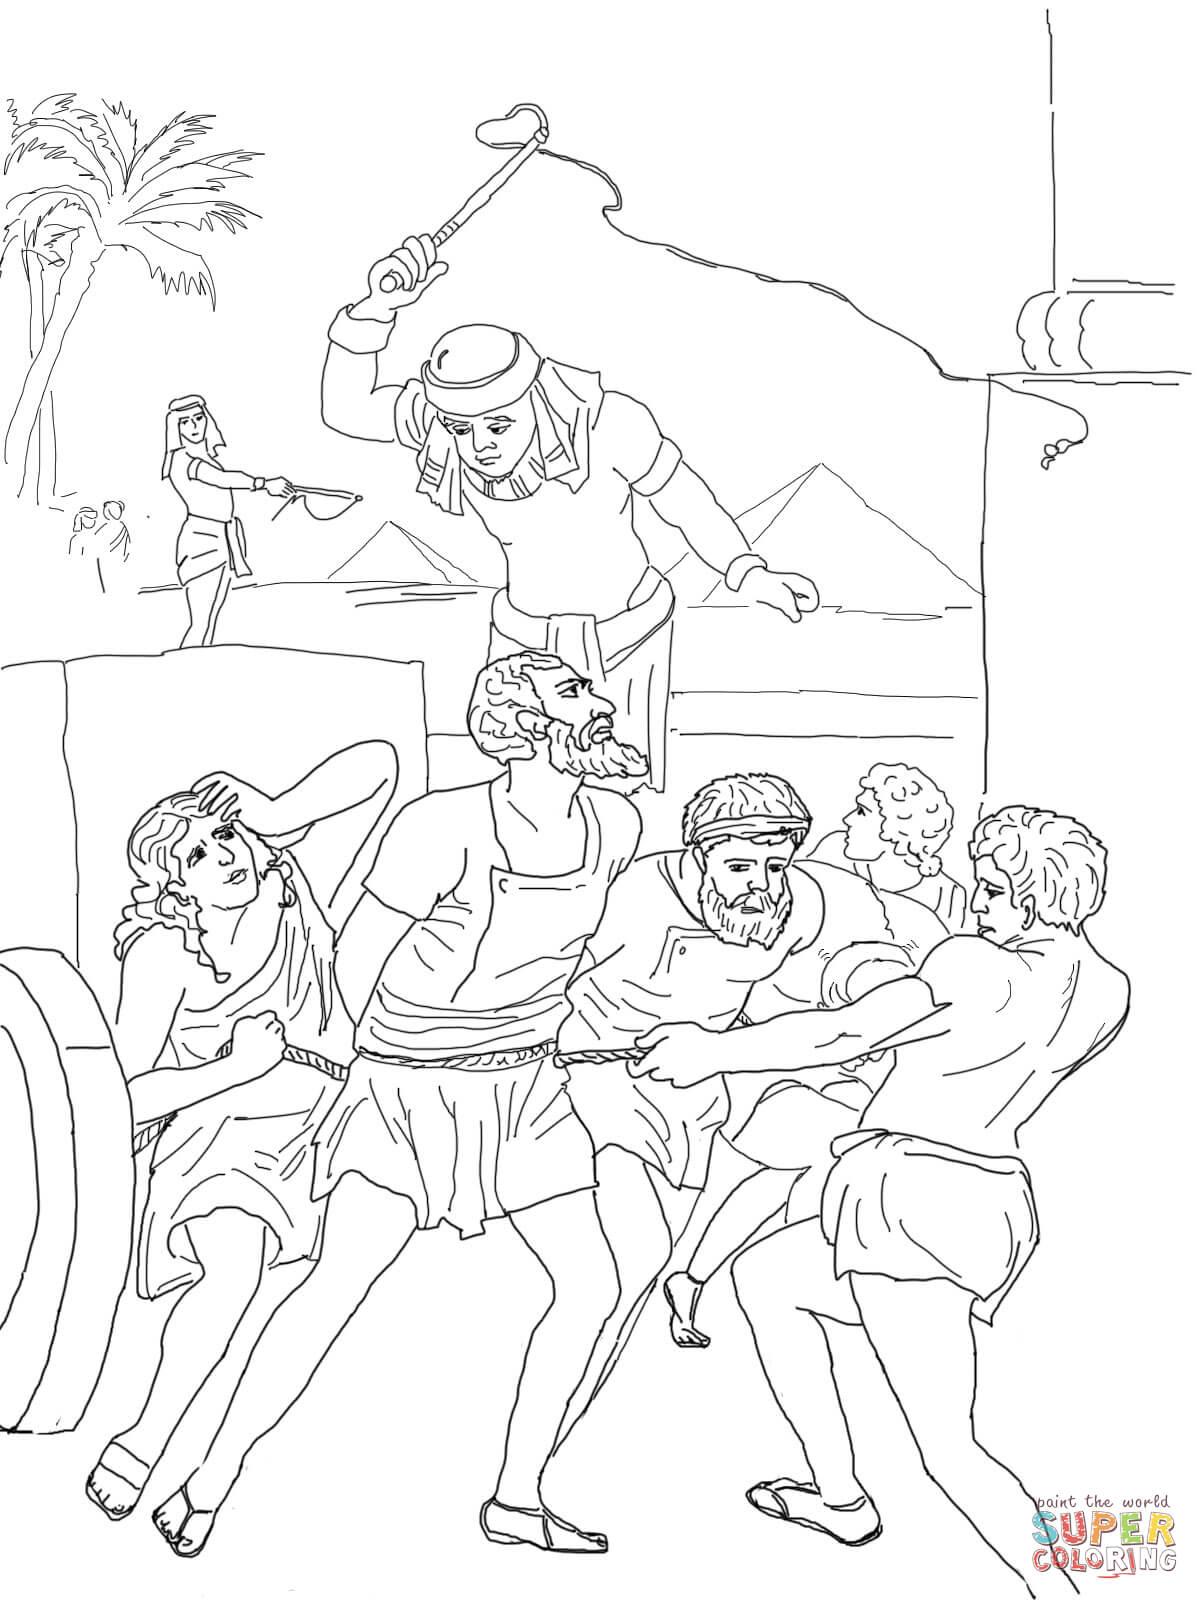 Desenho De Escravidao Egipcia Dos Israelitas Para Colorir